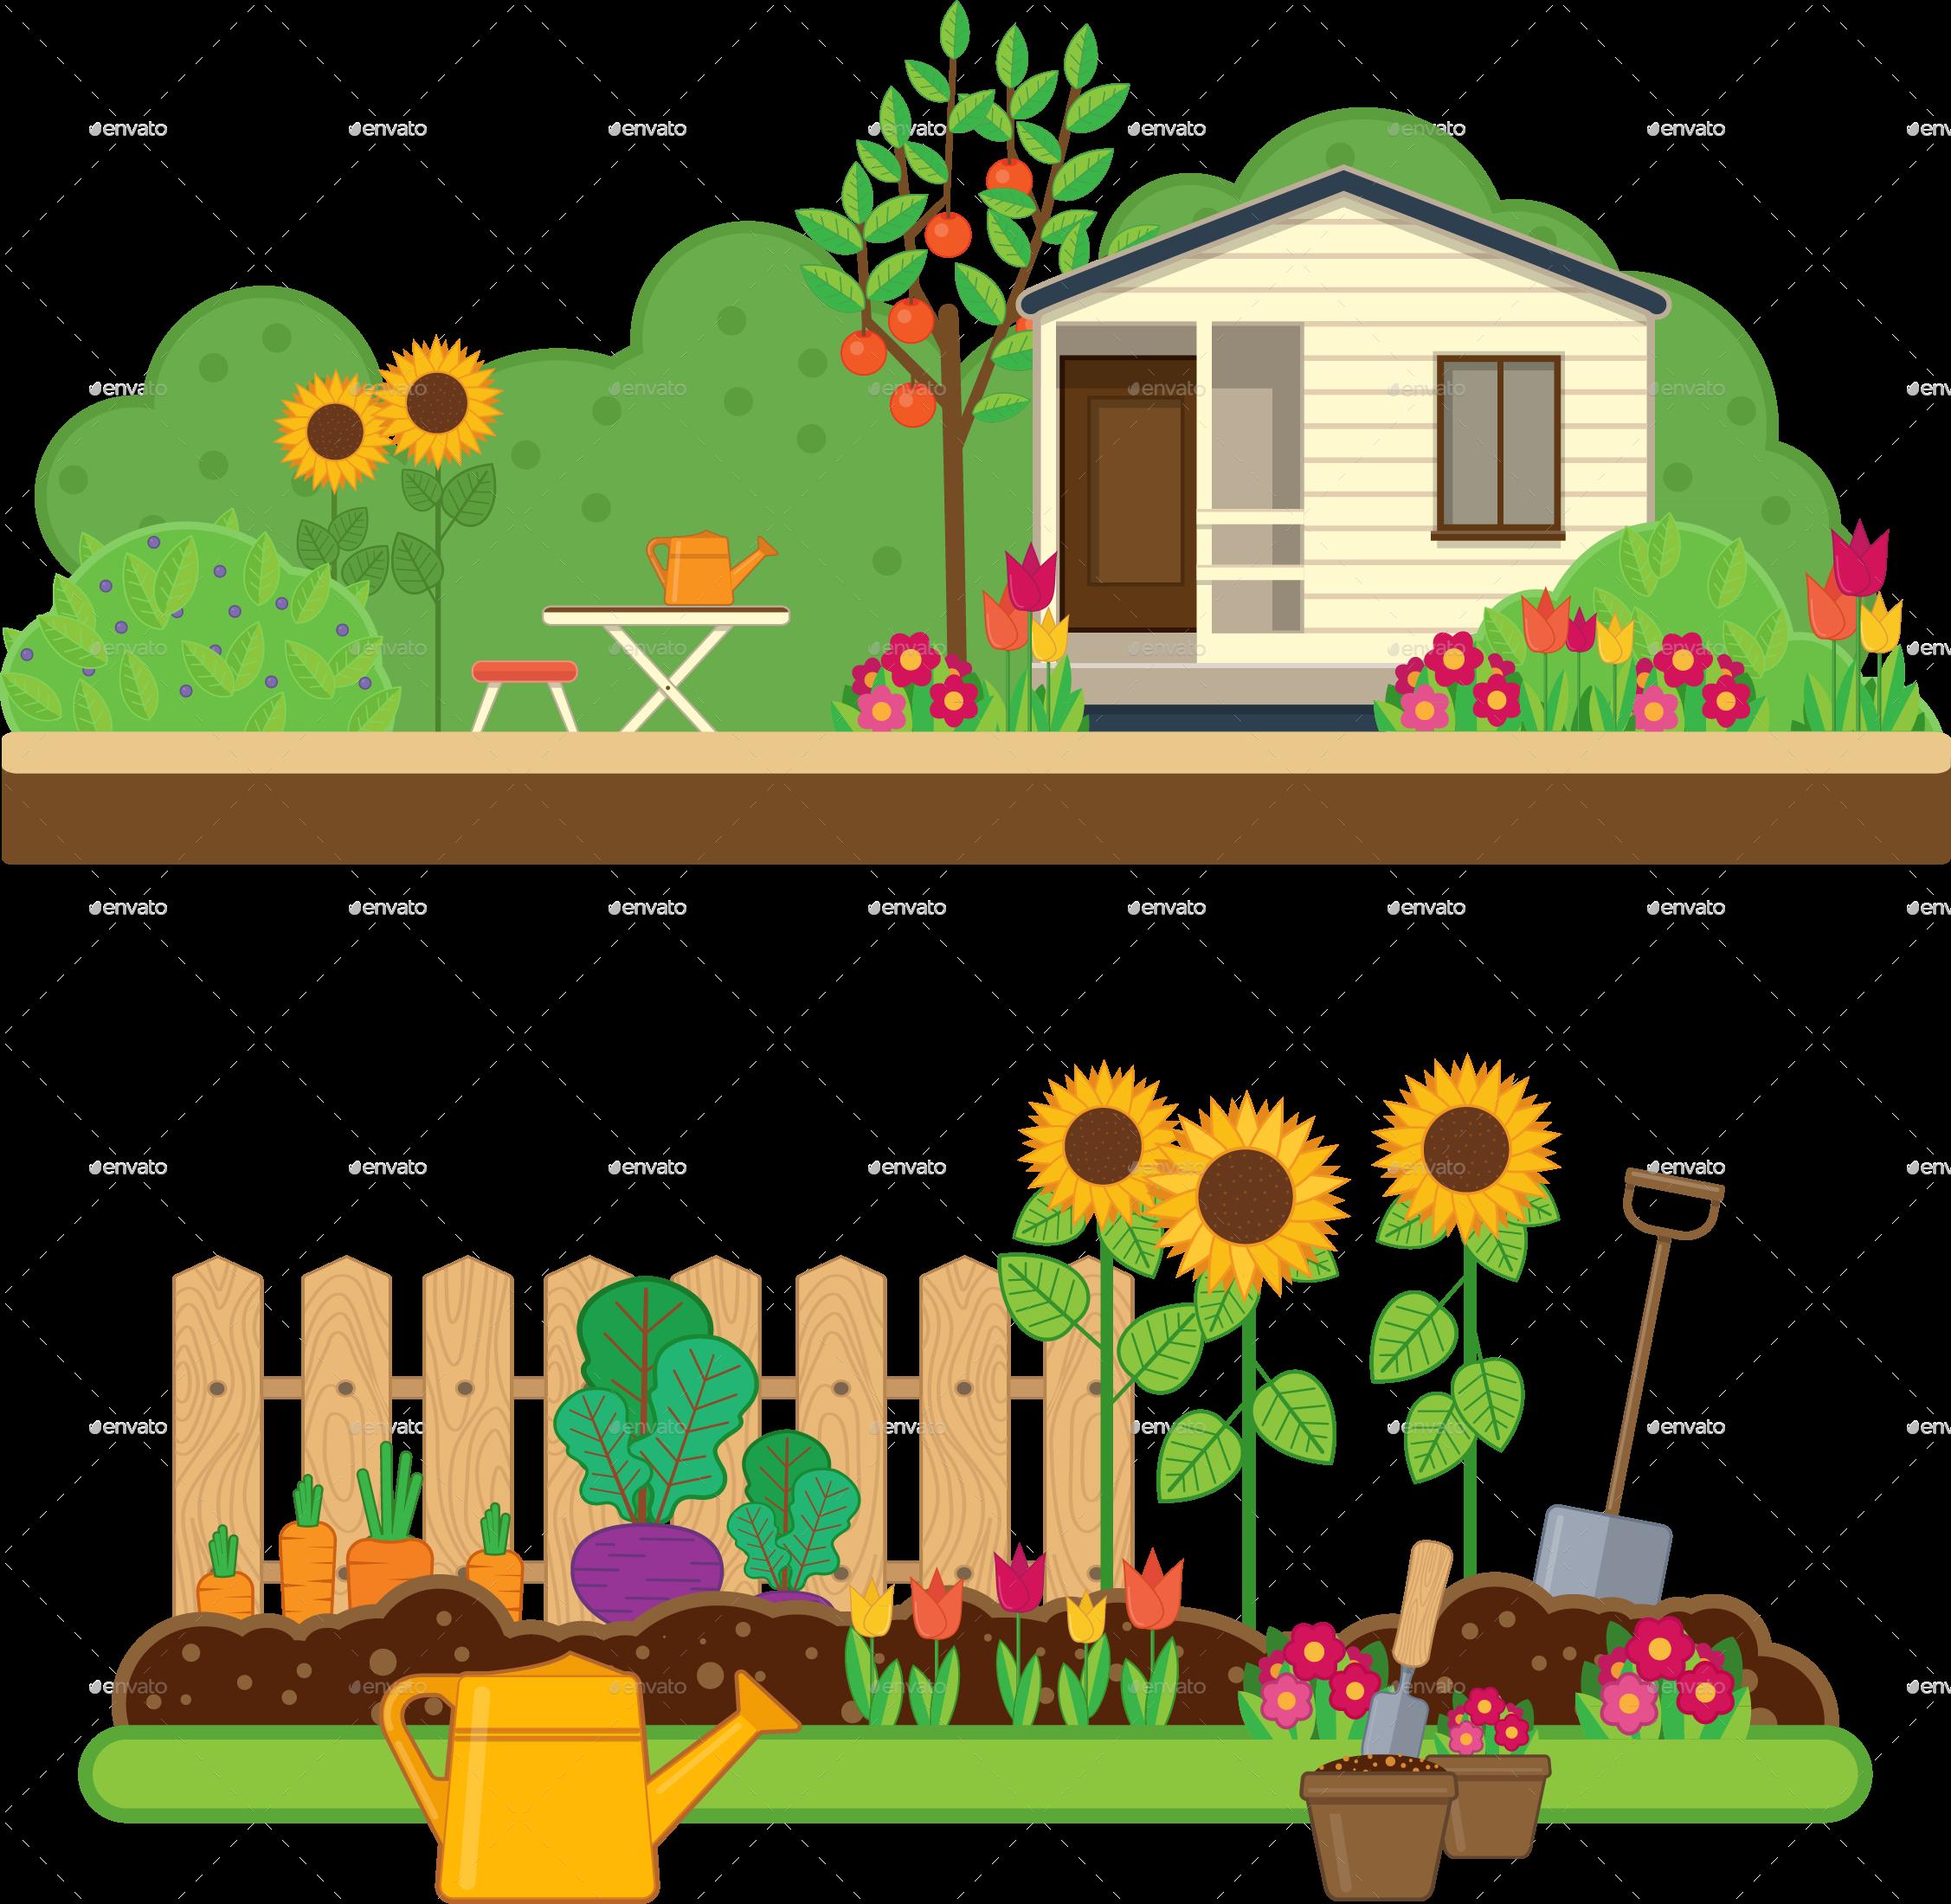 Garden clipart home garden, Garden home garden Transparent.